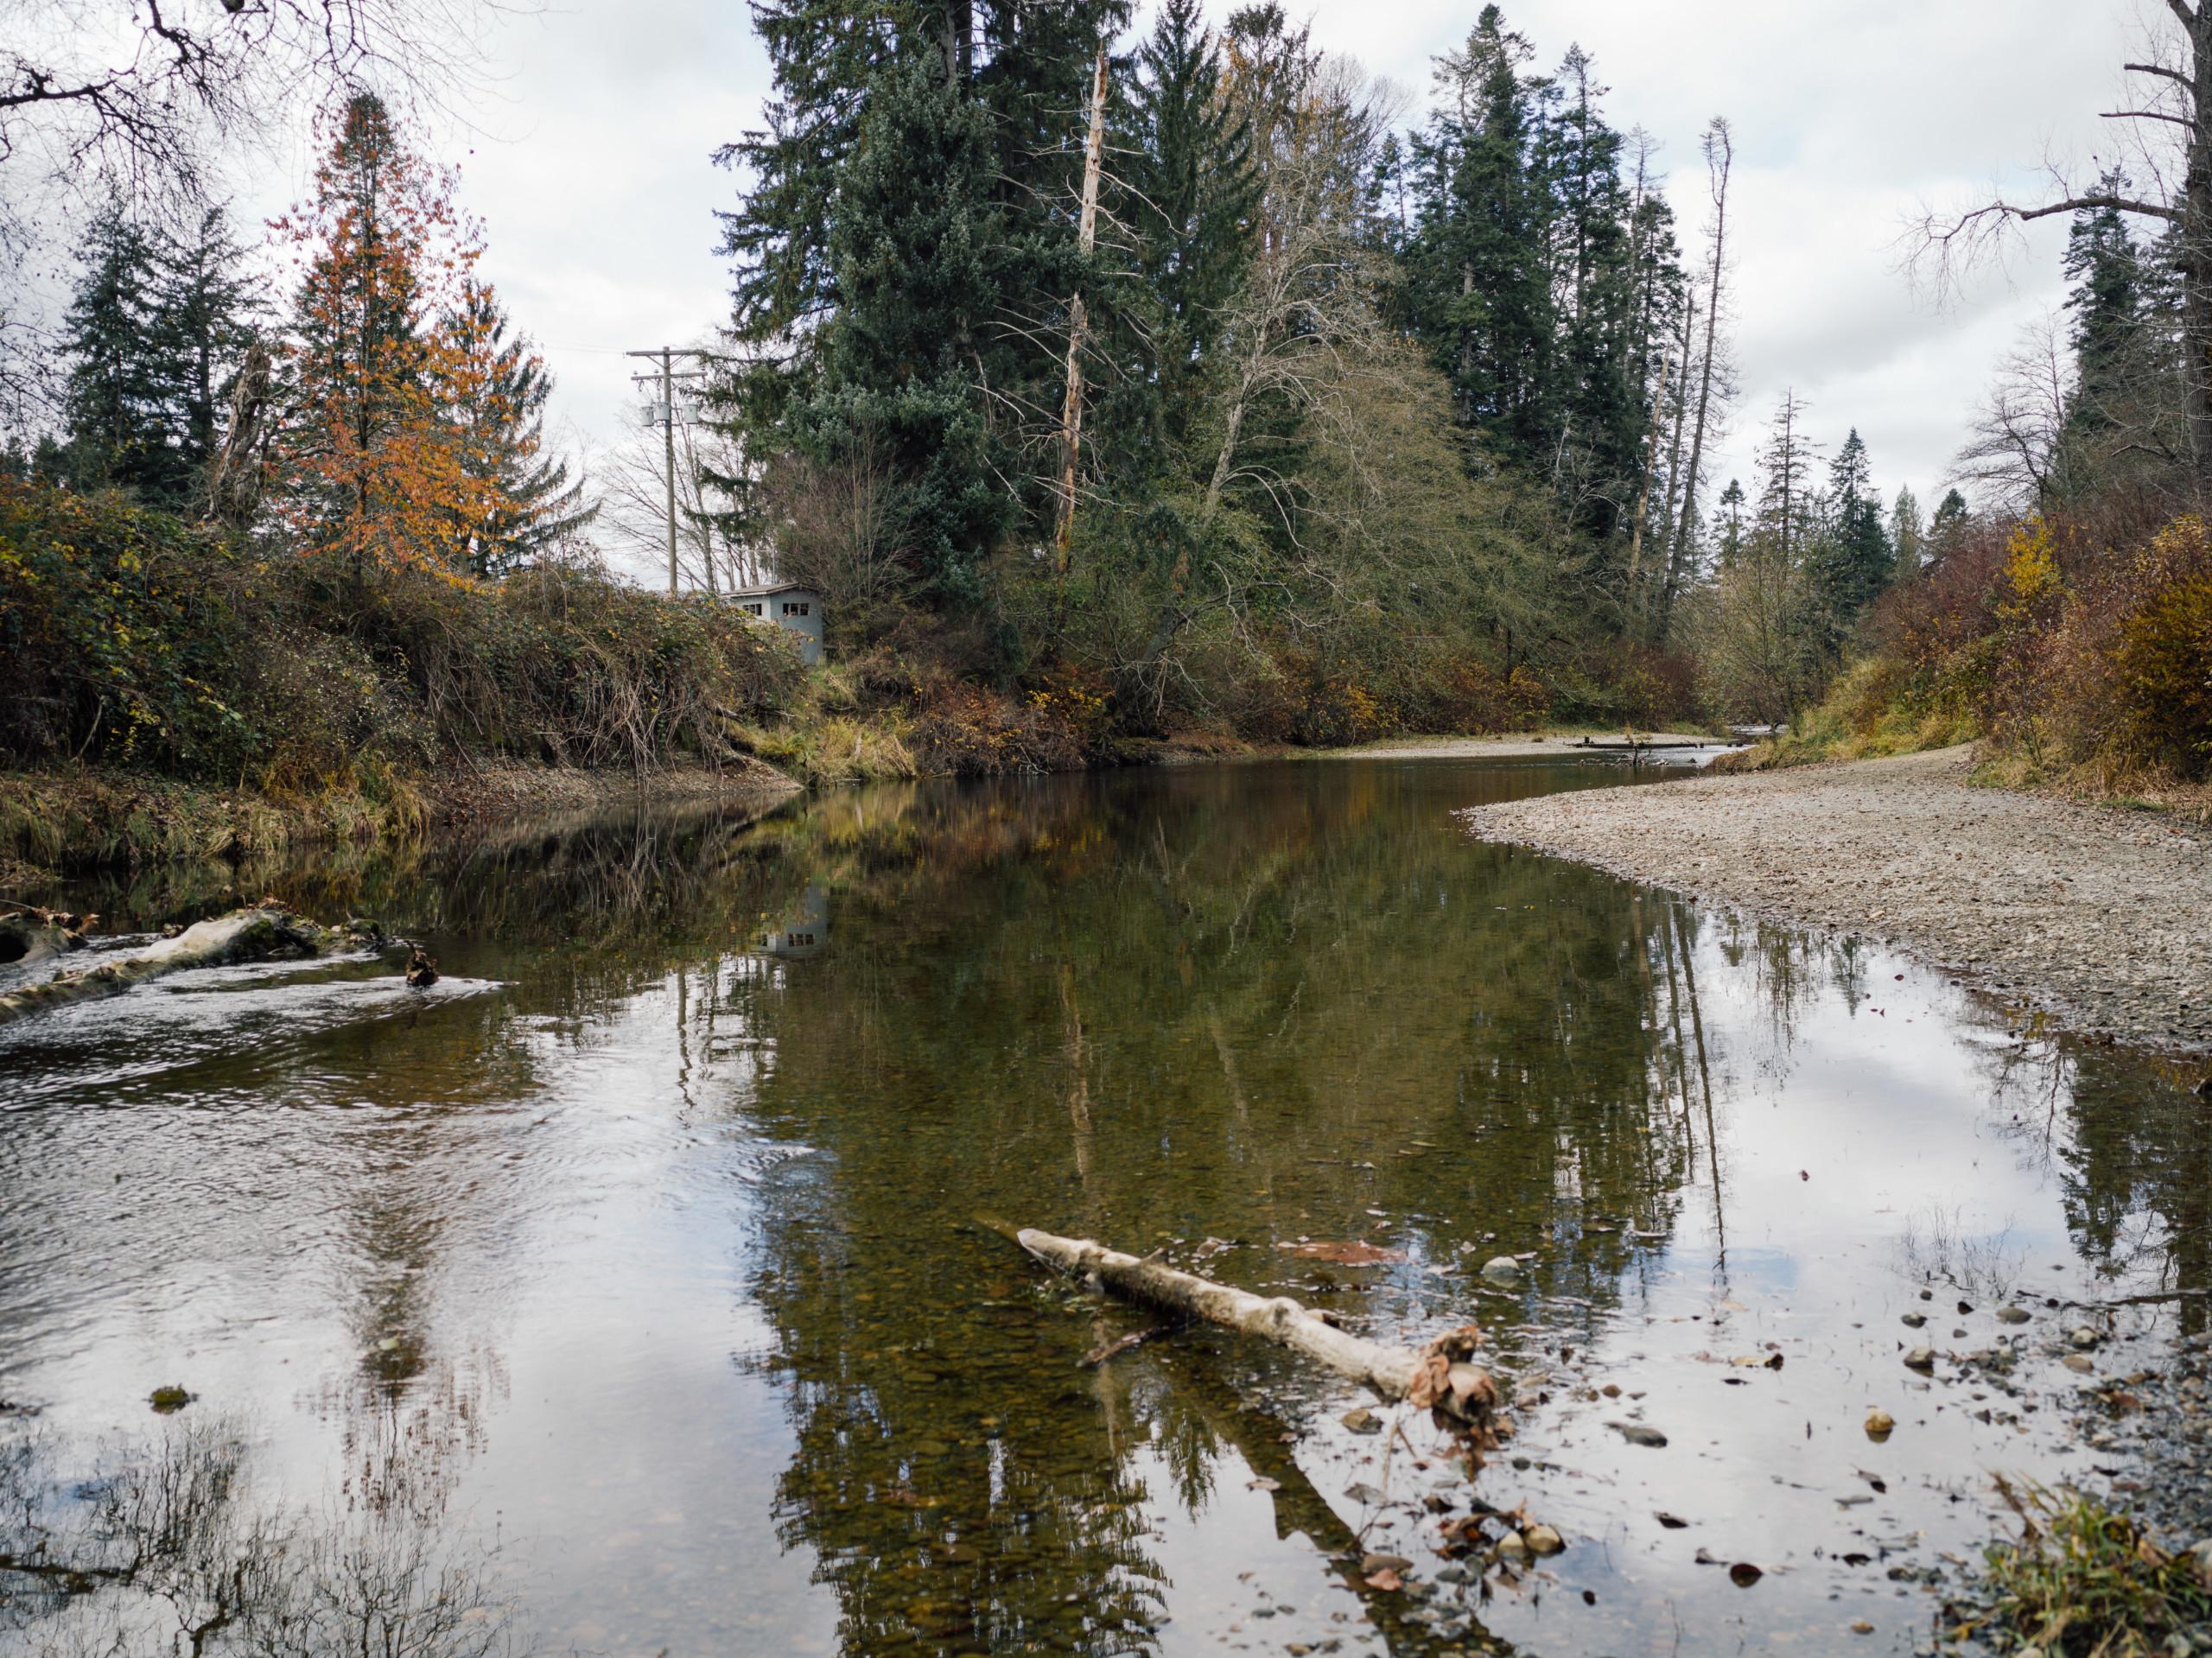 The Tsolum River